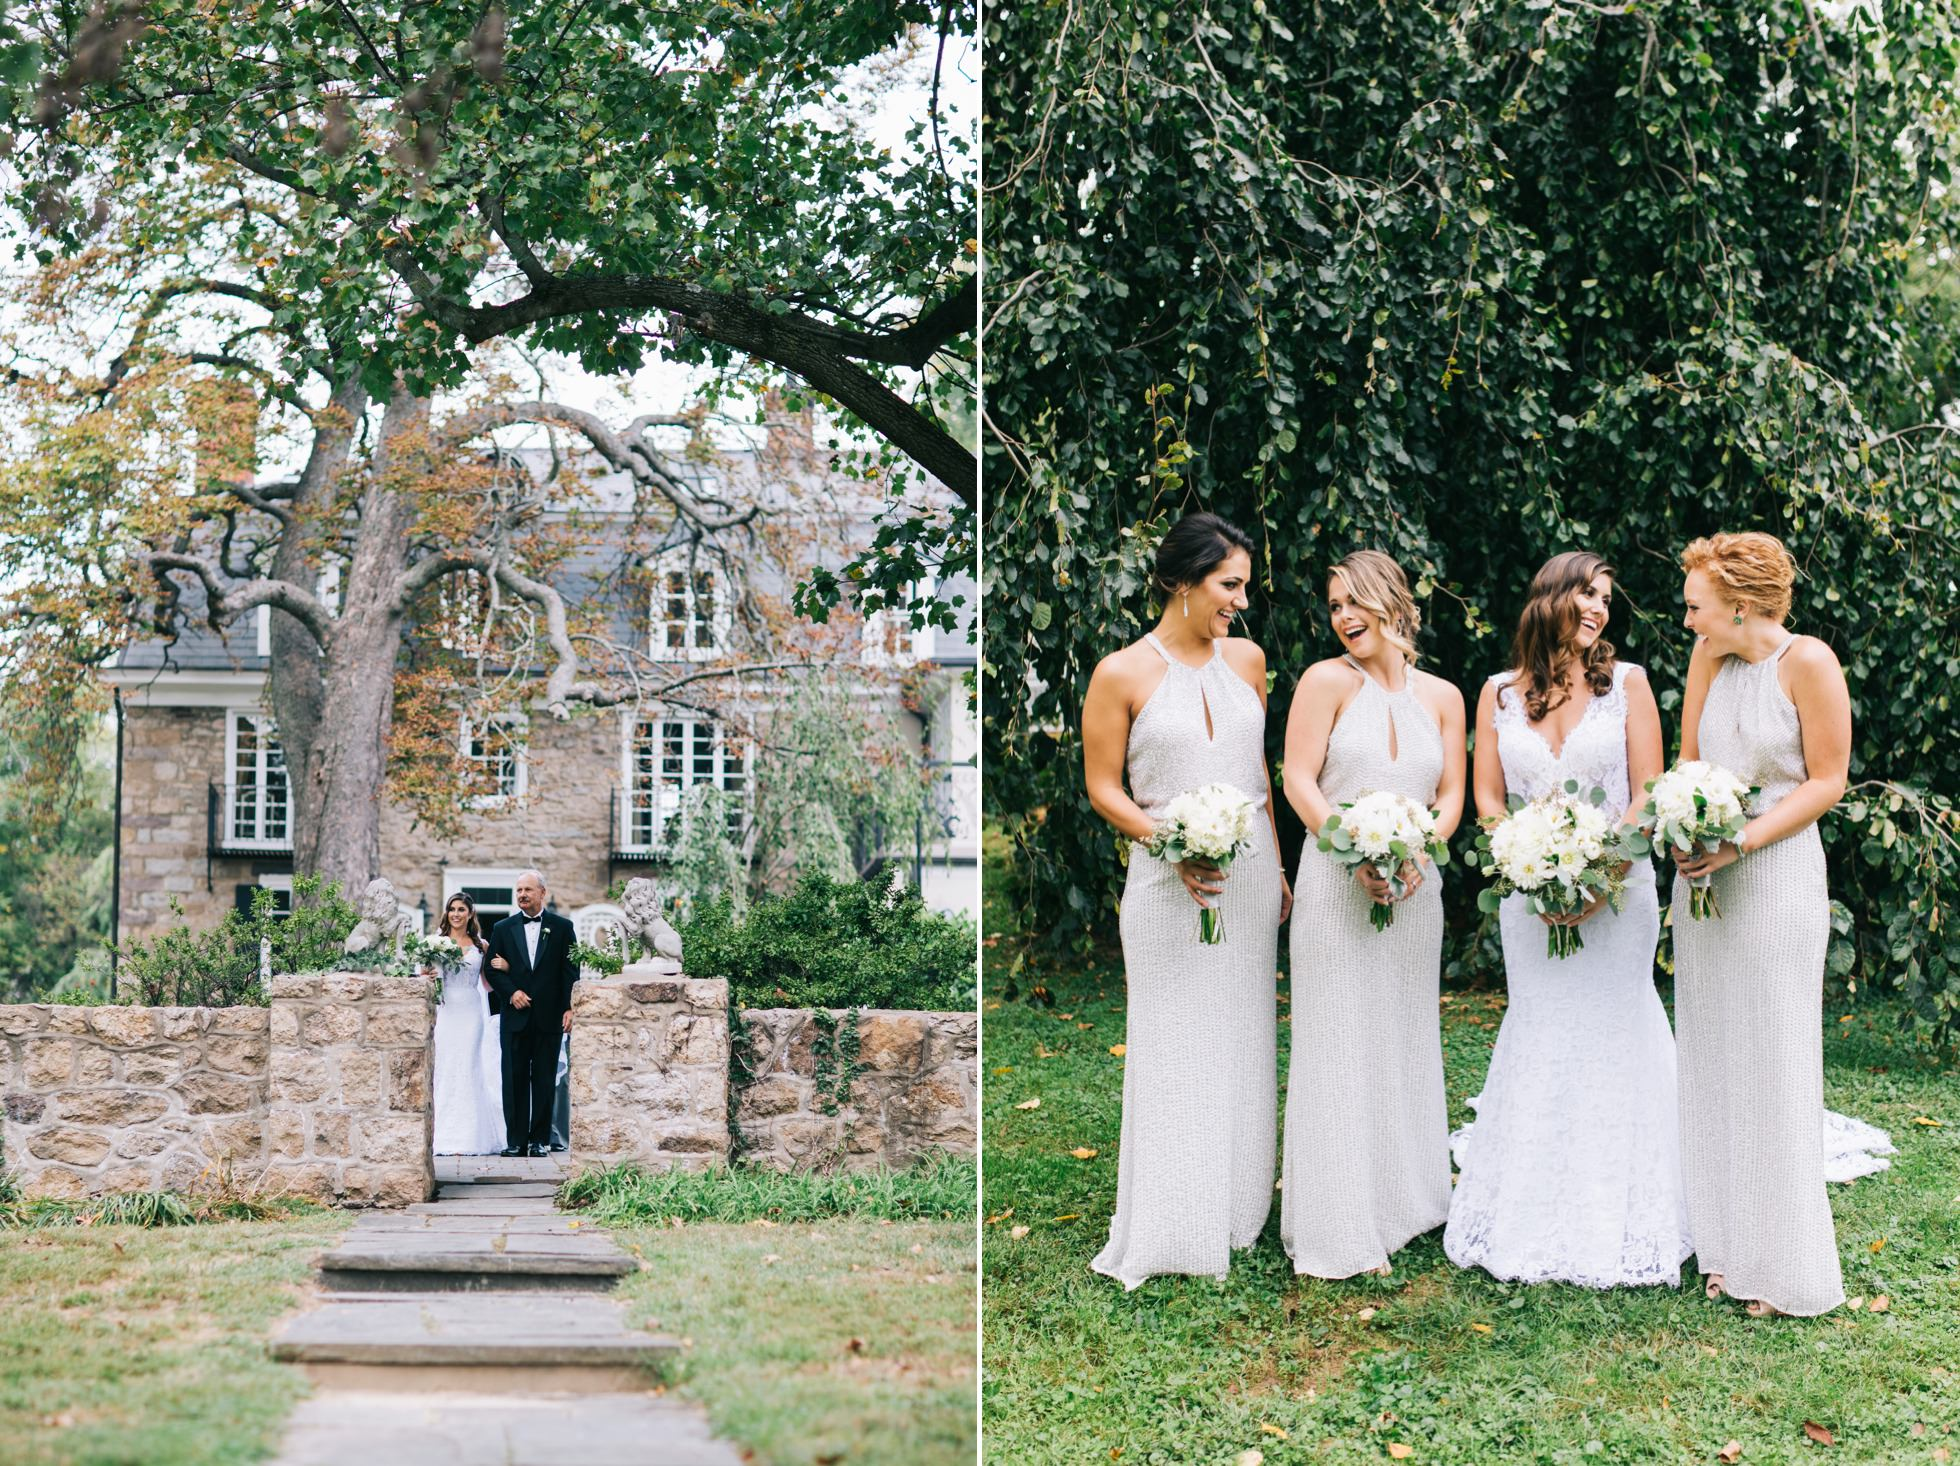 Best Unique PA NY NJ Wedding Venues - Barley Sheaf Farm Tent